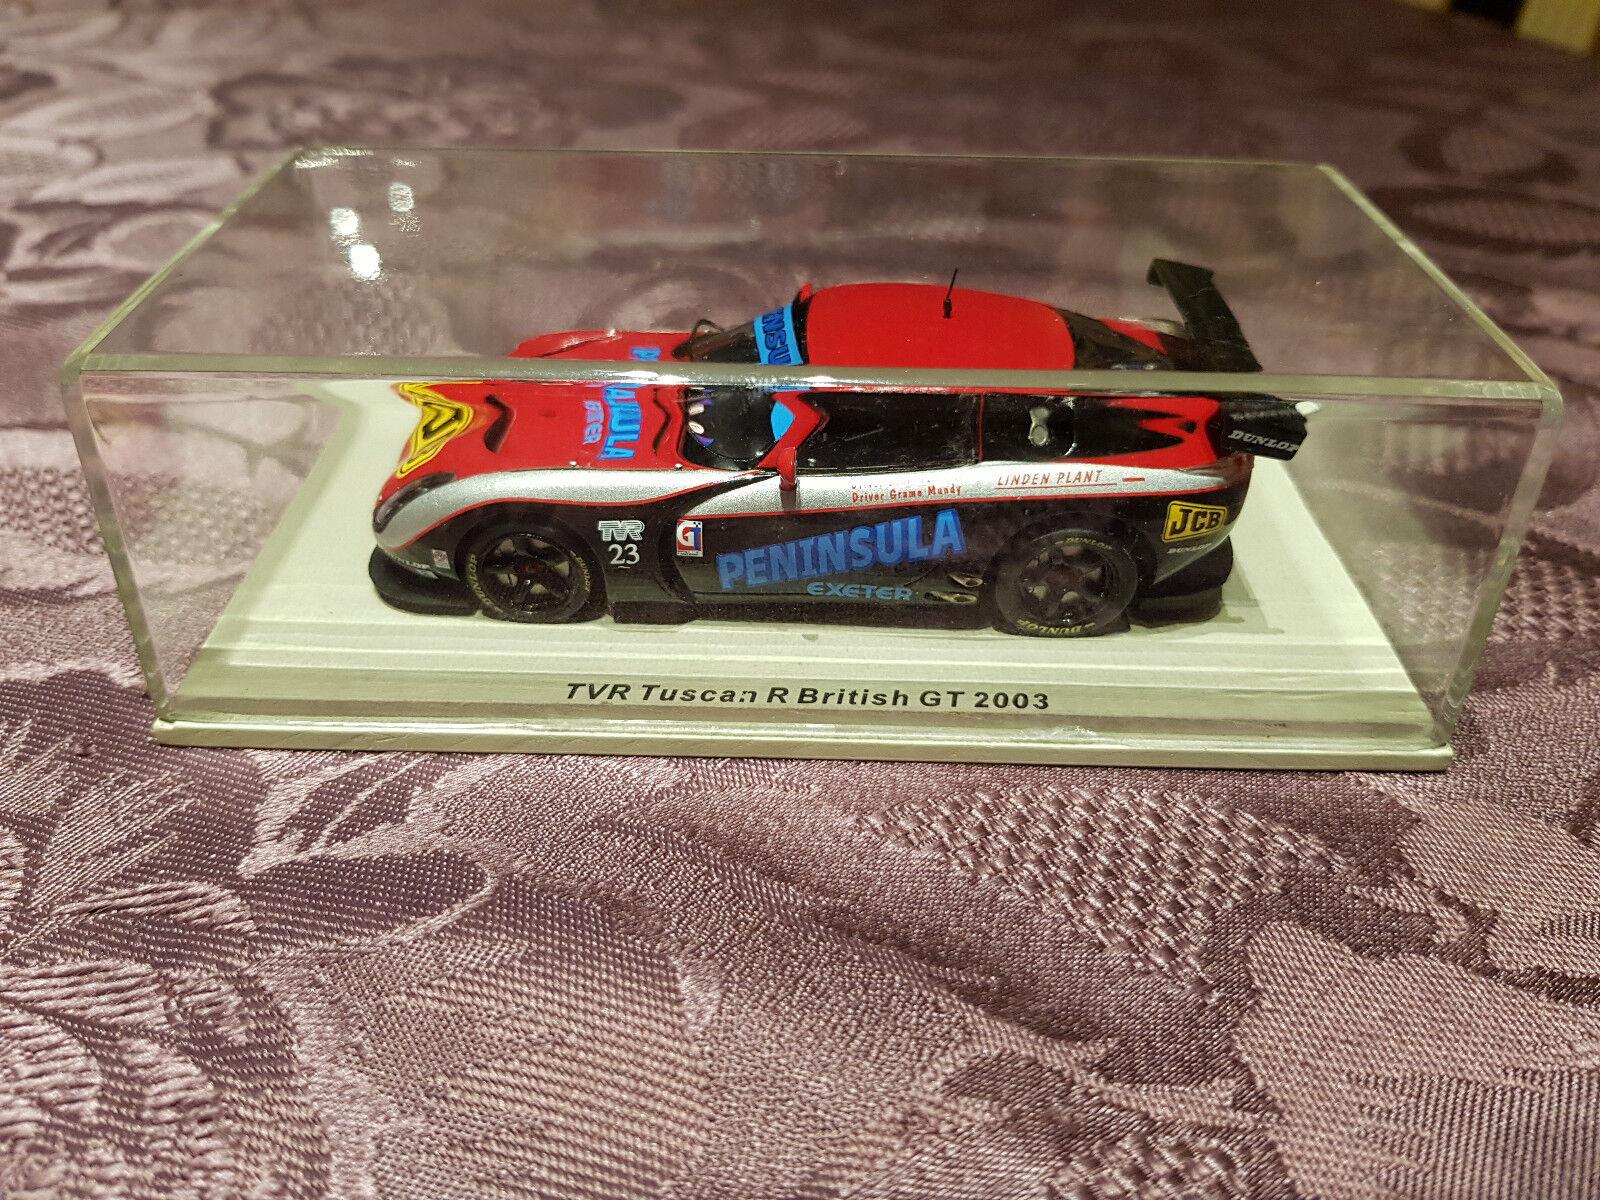 autentico en linea Voiture Spark Model 24 Heures Heures Heures Mans TVR Tuscan R British GT 2003 Box Boîte N°23  envío gratis